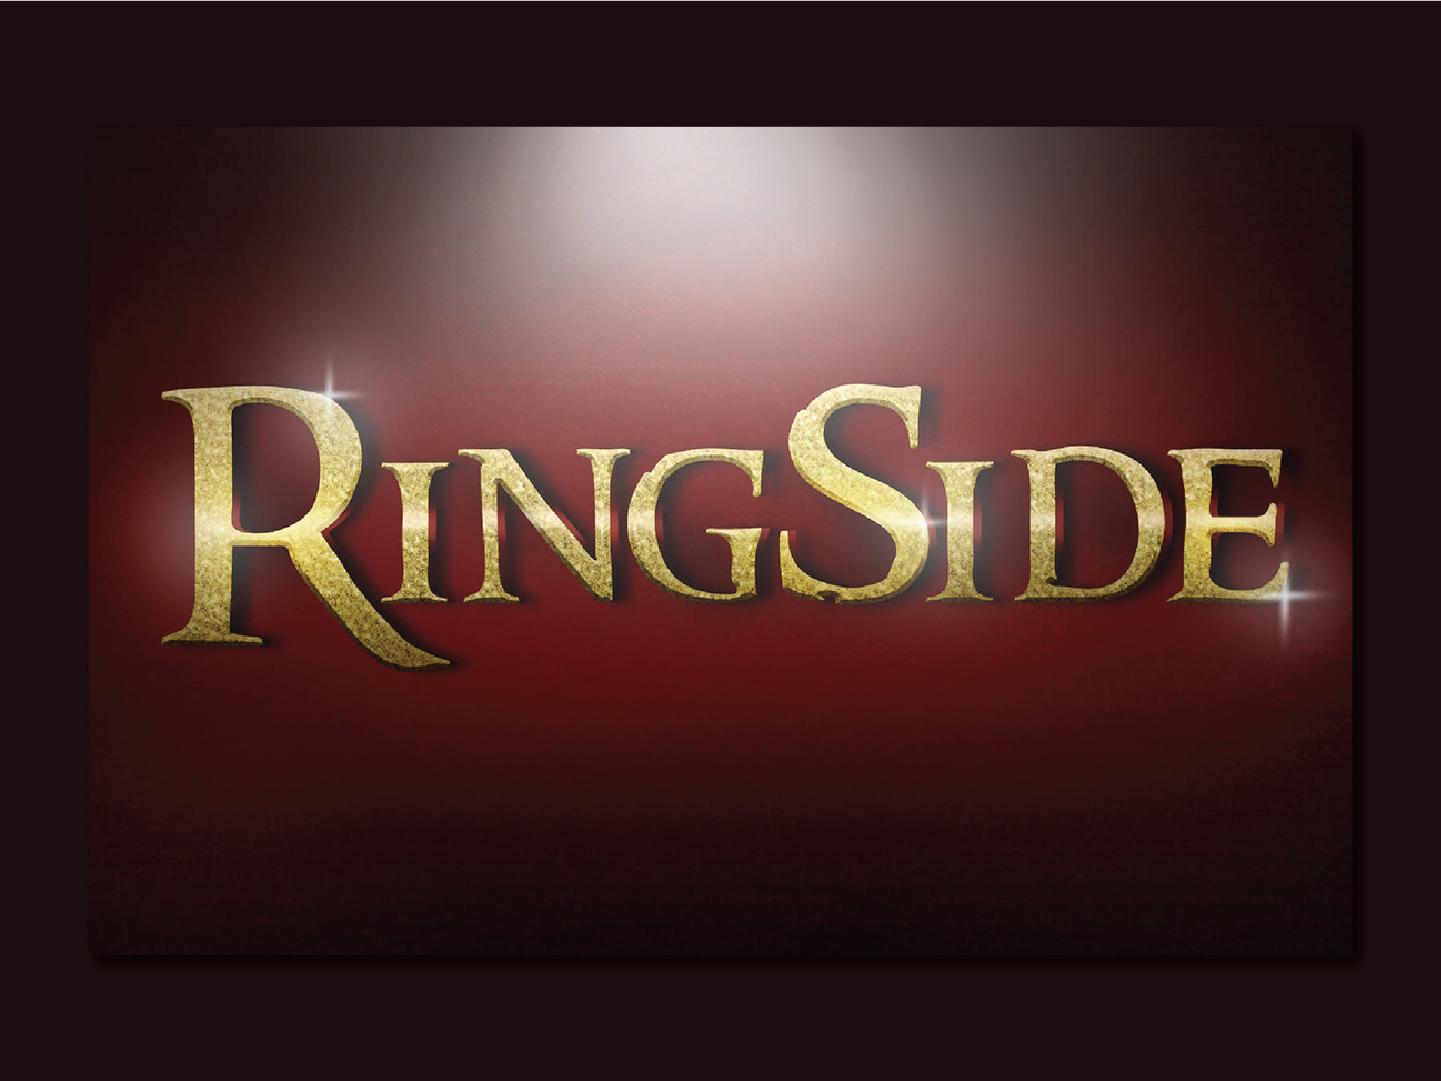 RingSide | Movie Premier Logo by RIDDHI MISHRA on Dribbble